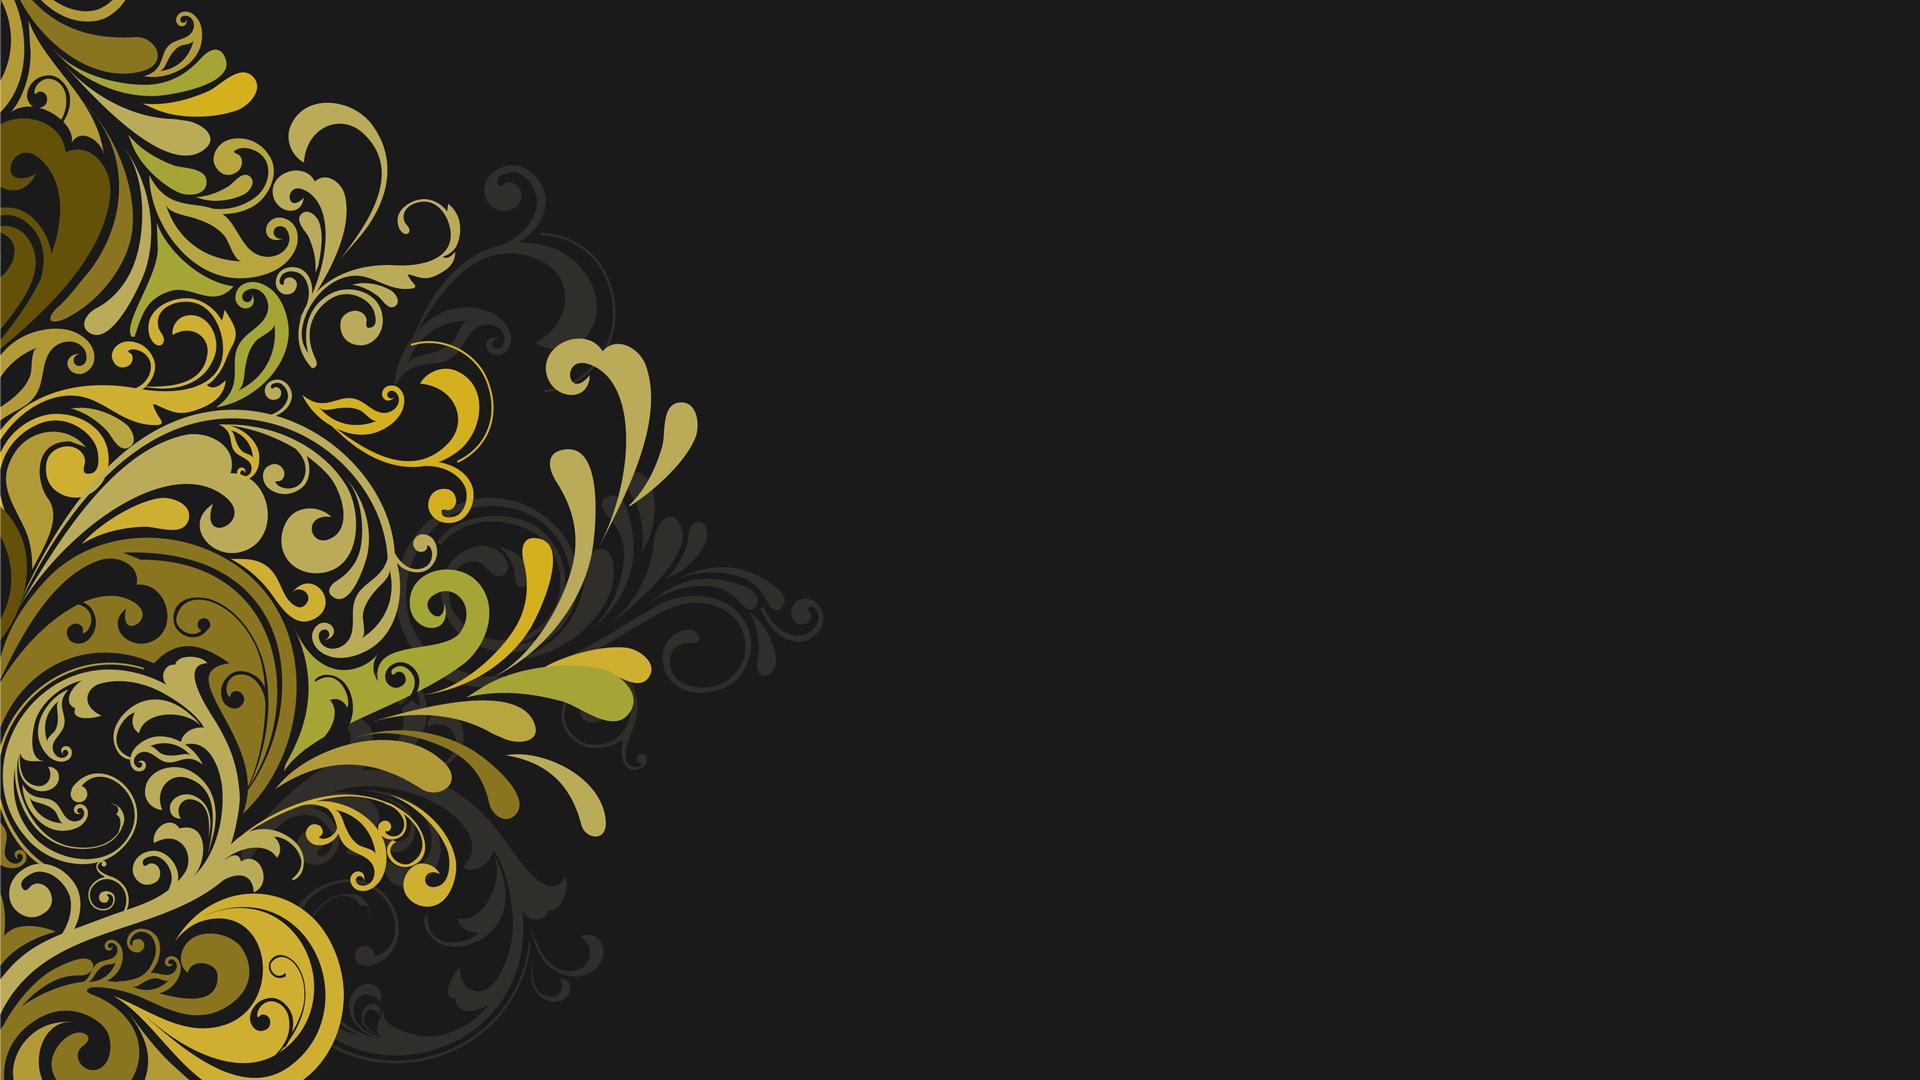 General 1920x1080 floral vector digital art dark background